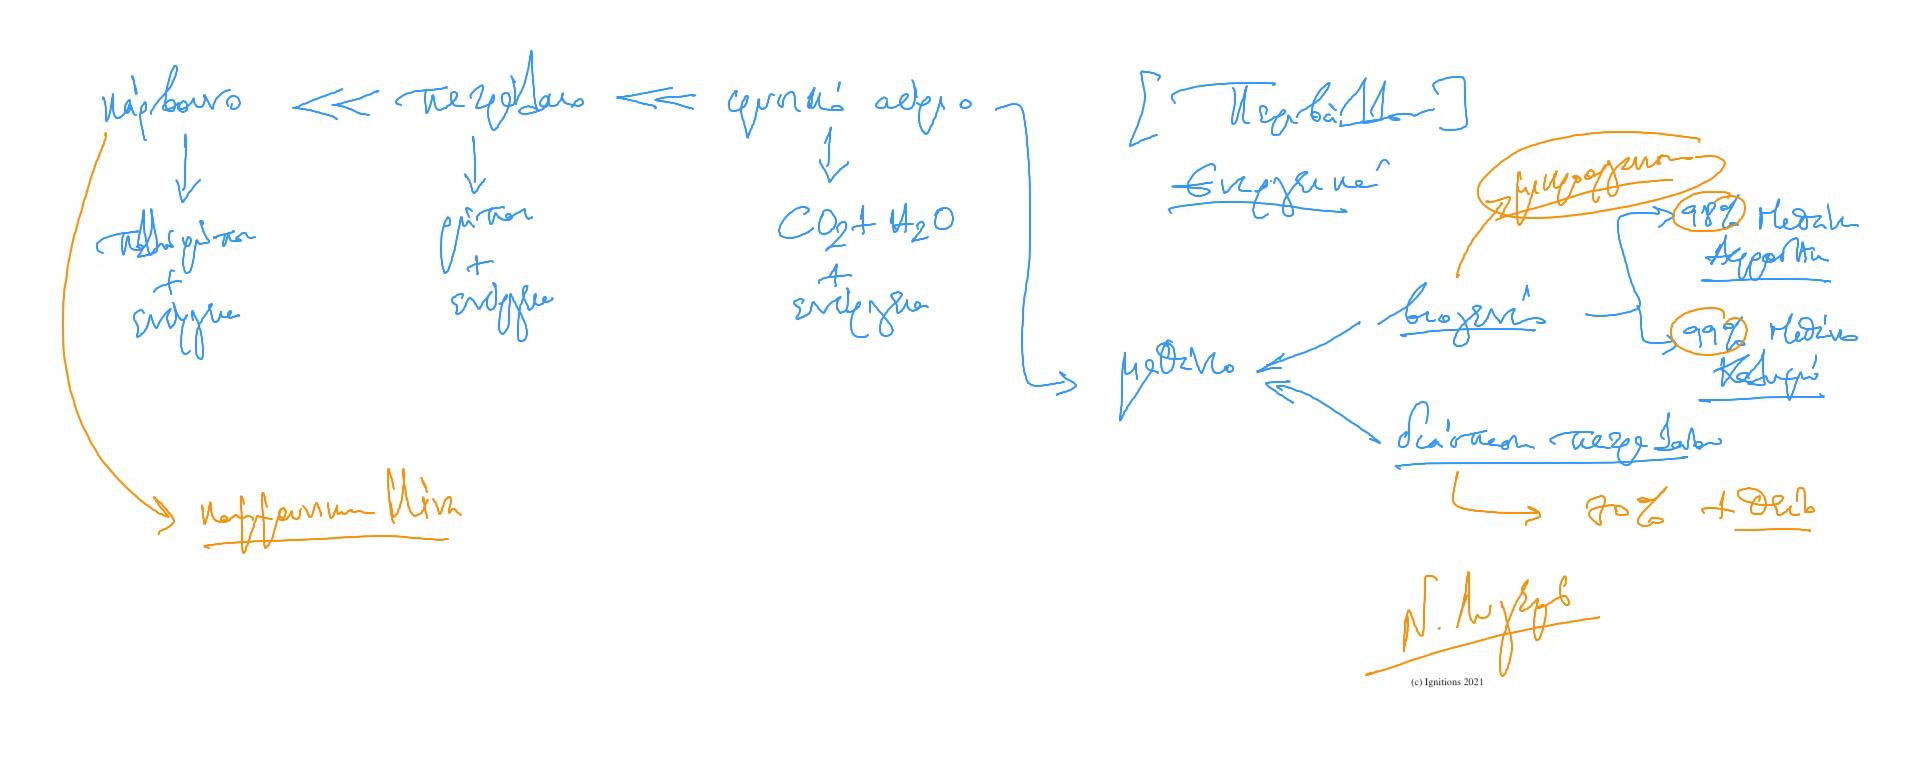 65114 - e-Μάθημα I: Ενεργειακά δεδομένα και Δράσεις. (Dessin)